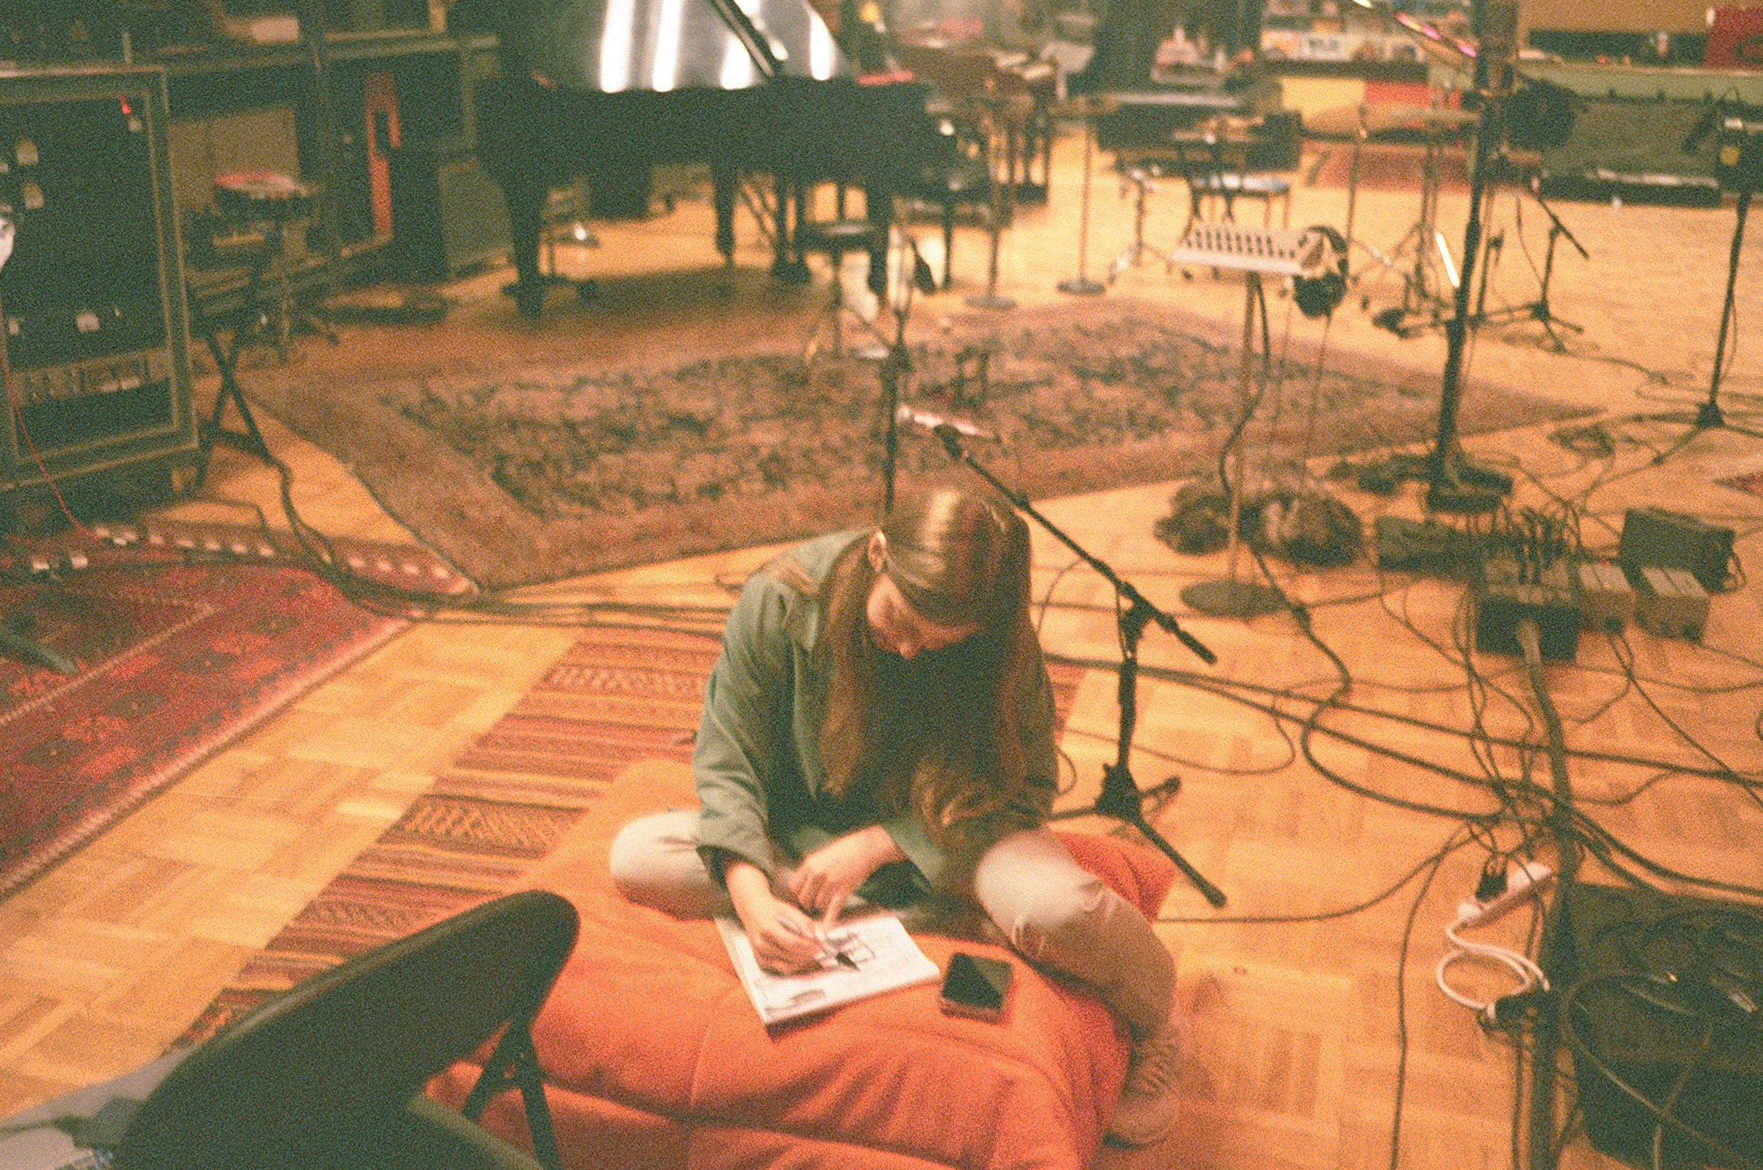 Jade Bird - Live at RCA Studios Nashville remote livestream